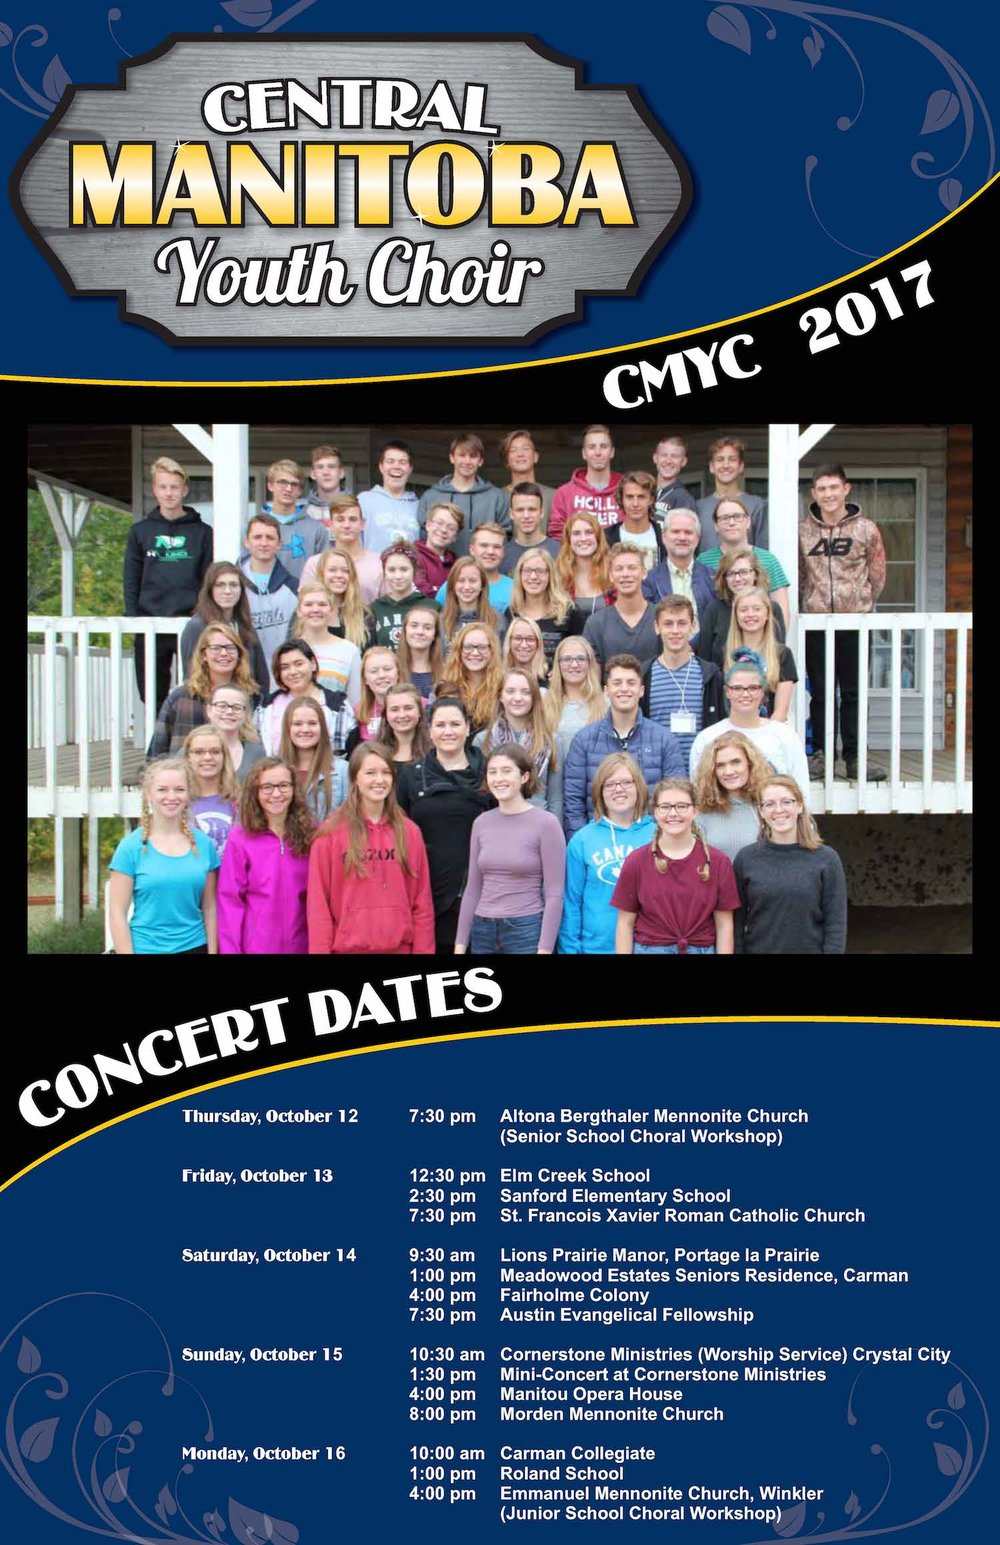 CMYC 2017 poster